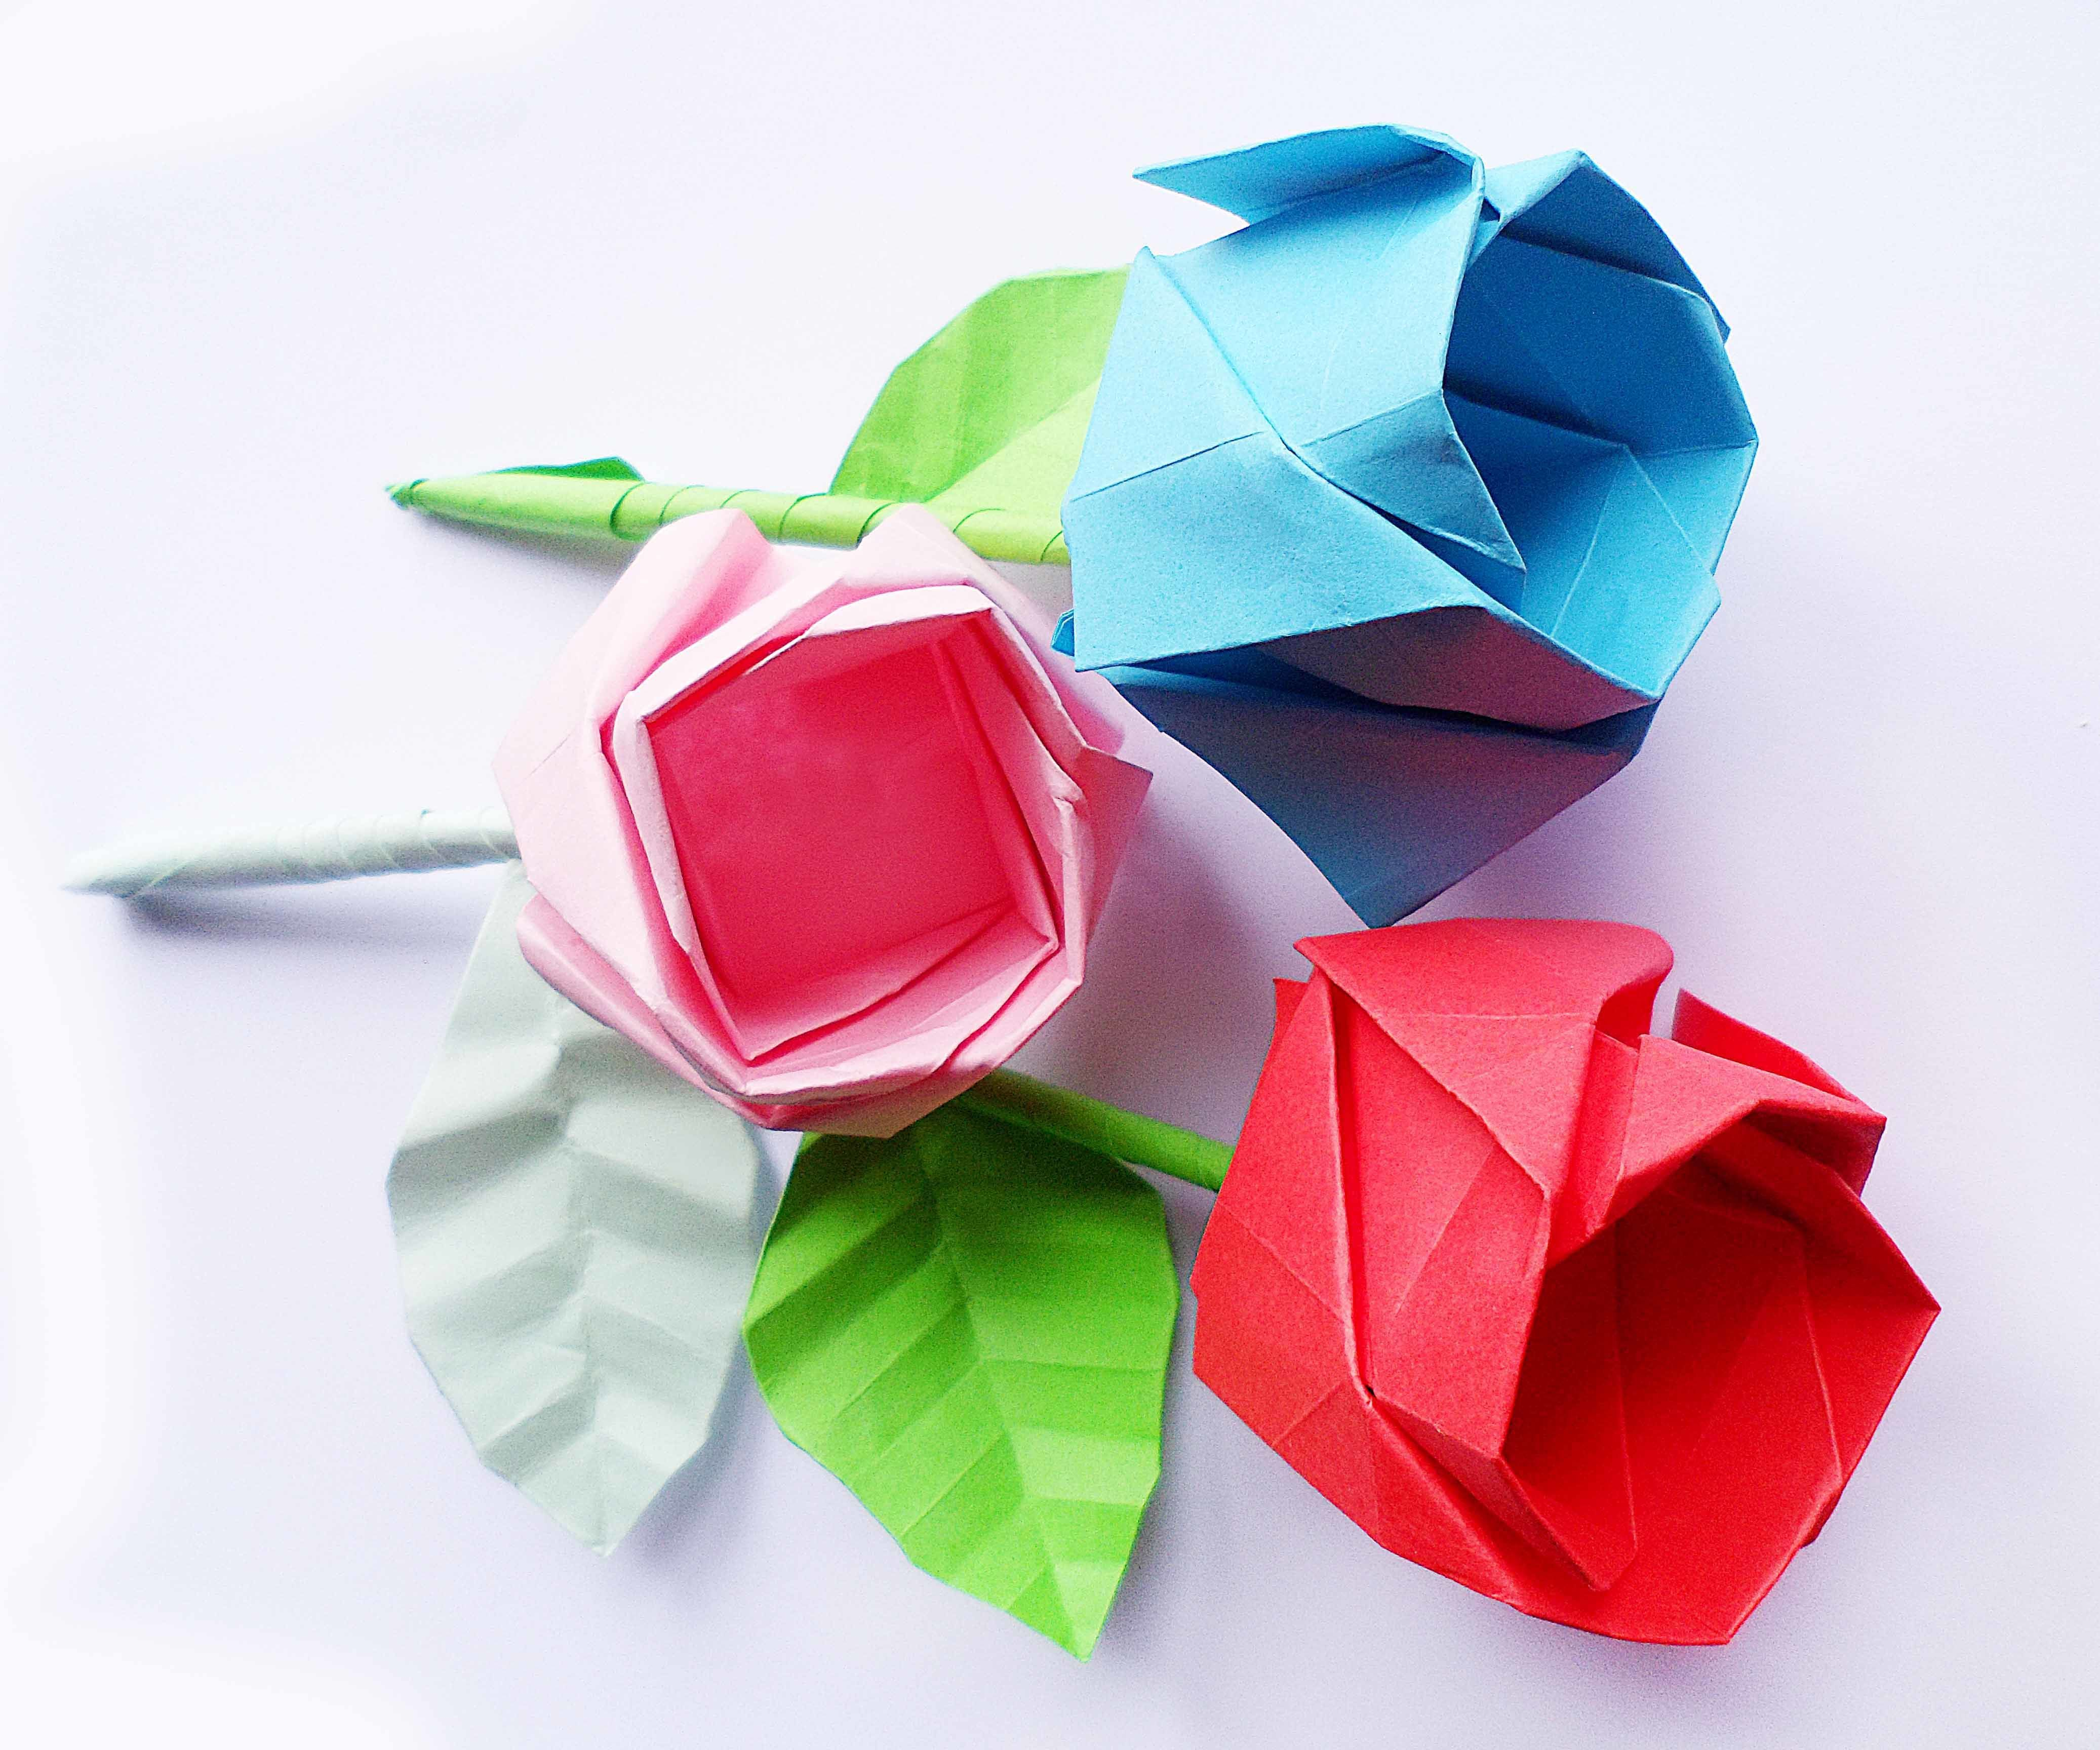 Diy Origami Rose Step By Step Diy Origami Origami And Tutorials